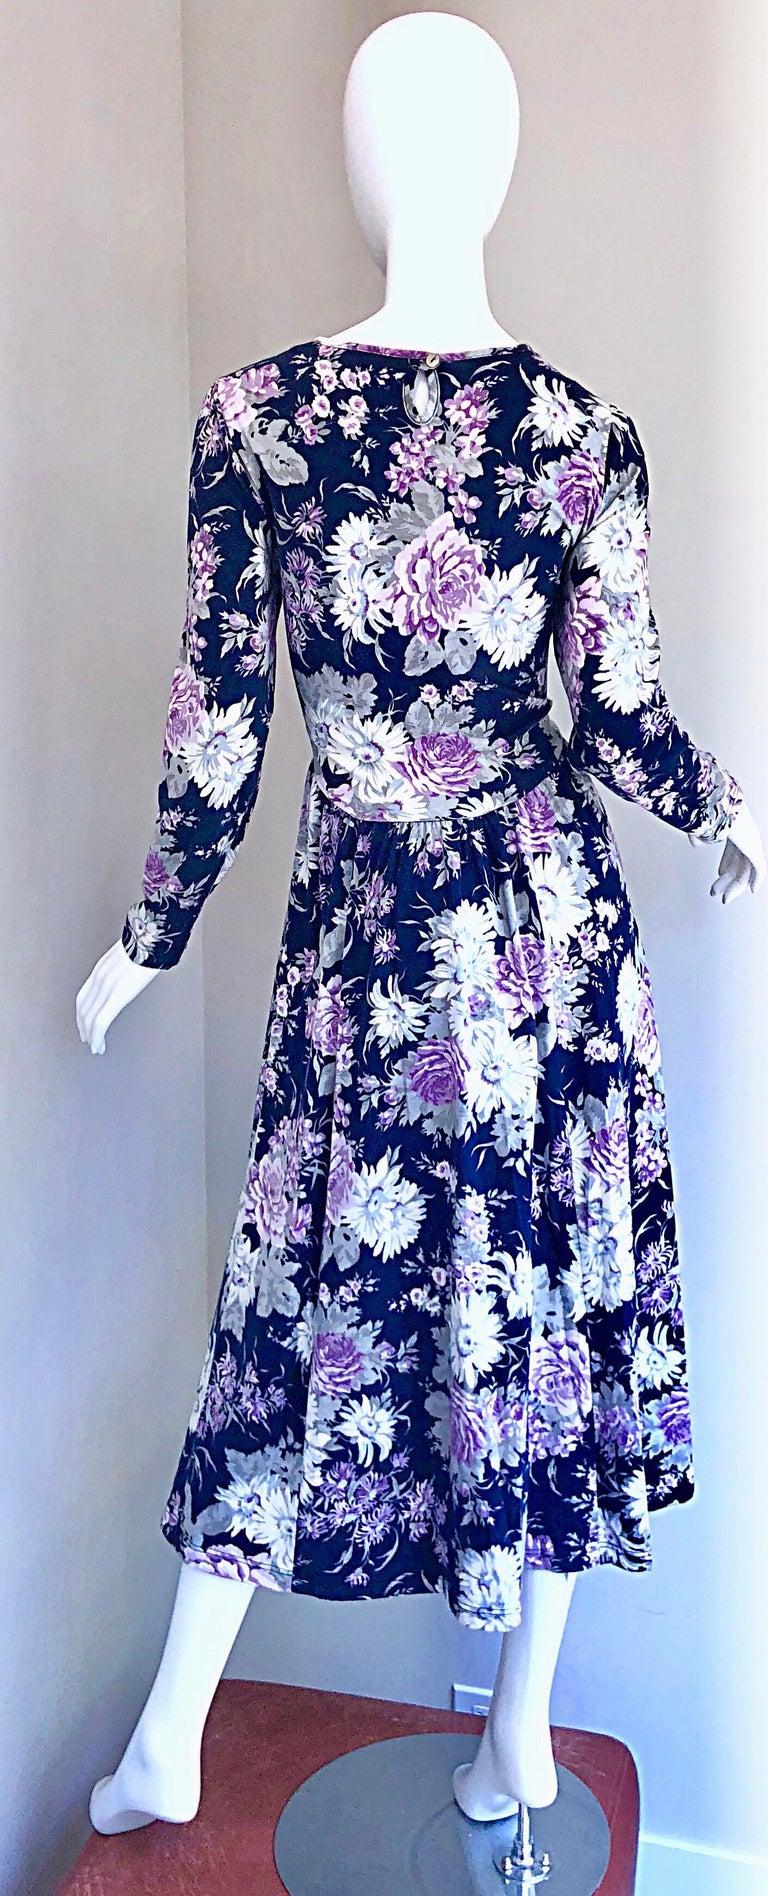 Women's 1990s Laura Ashley Navy Blue + Purple Long Sleeve Cotton Vintage 90s Midi Dress For Sale